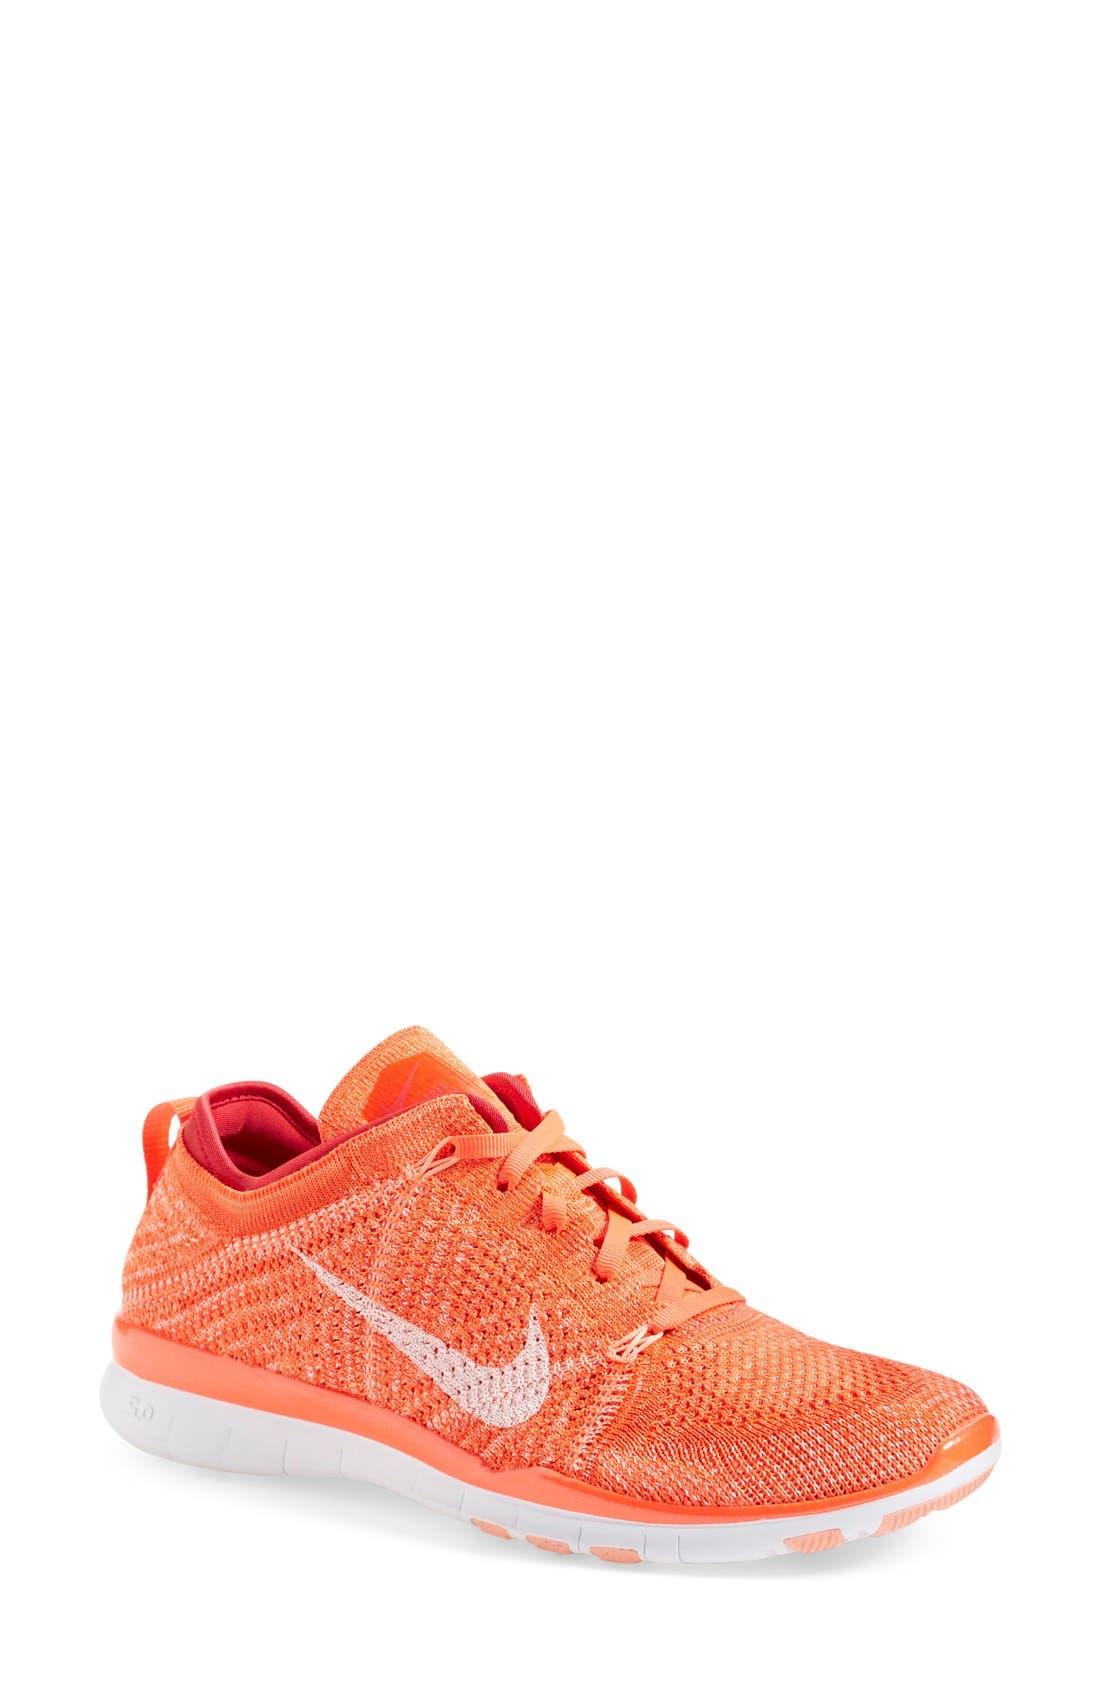 ,                             'Free Flyknit 5.0 TR' Training Shoe,                             Main thumbnail 64, color,                             897